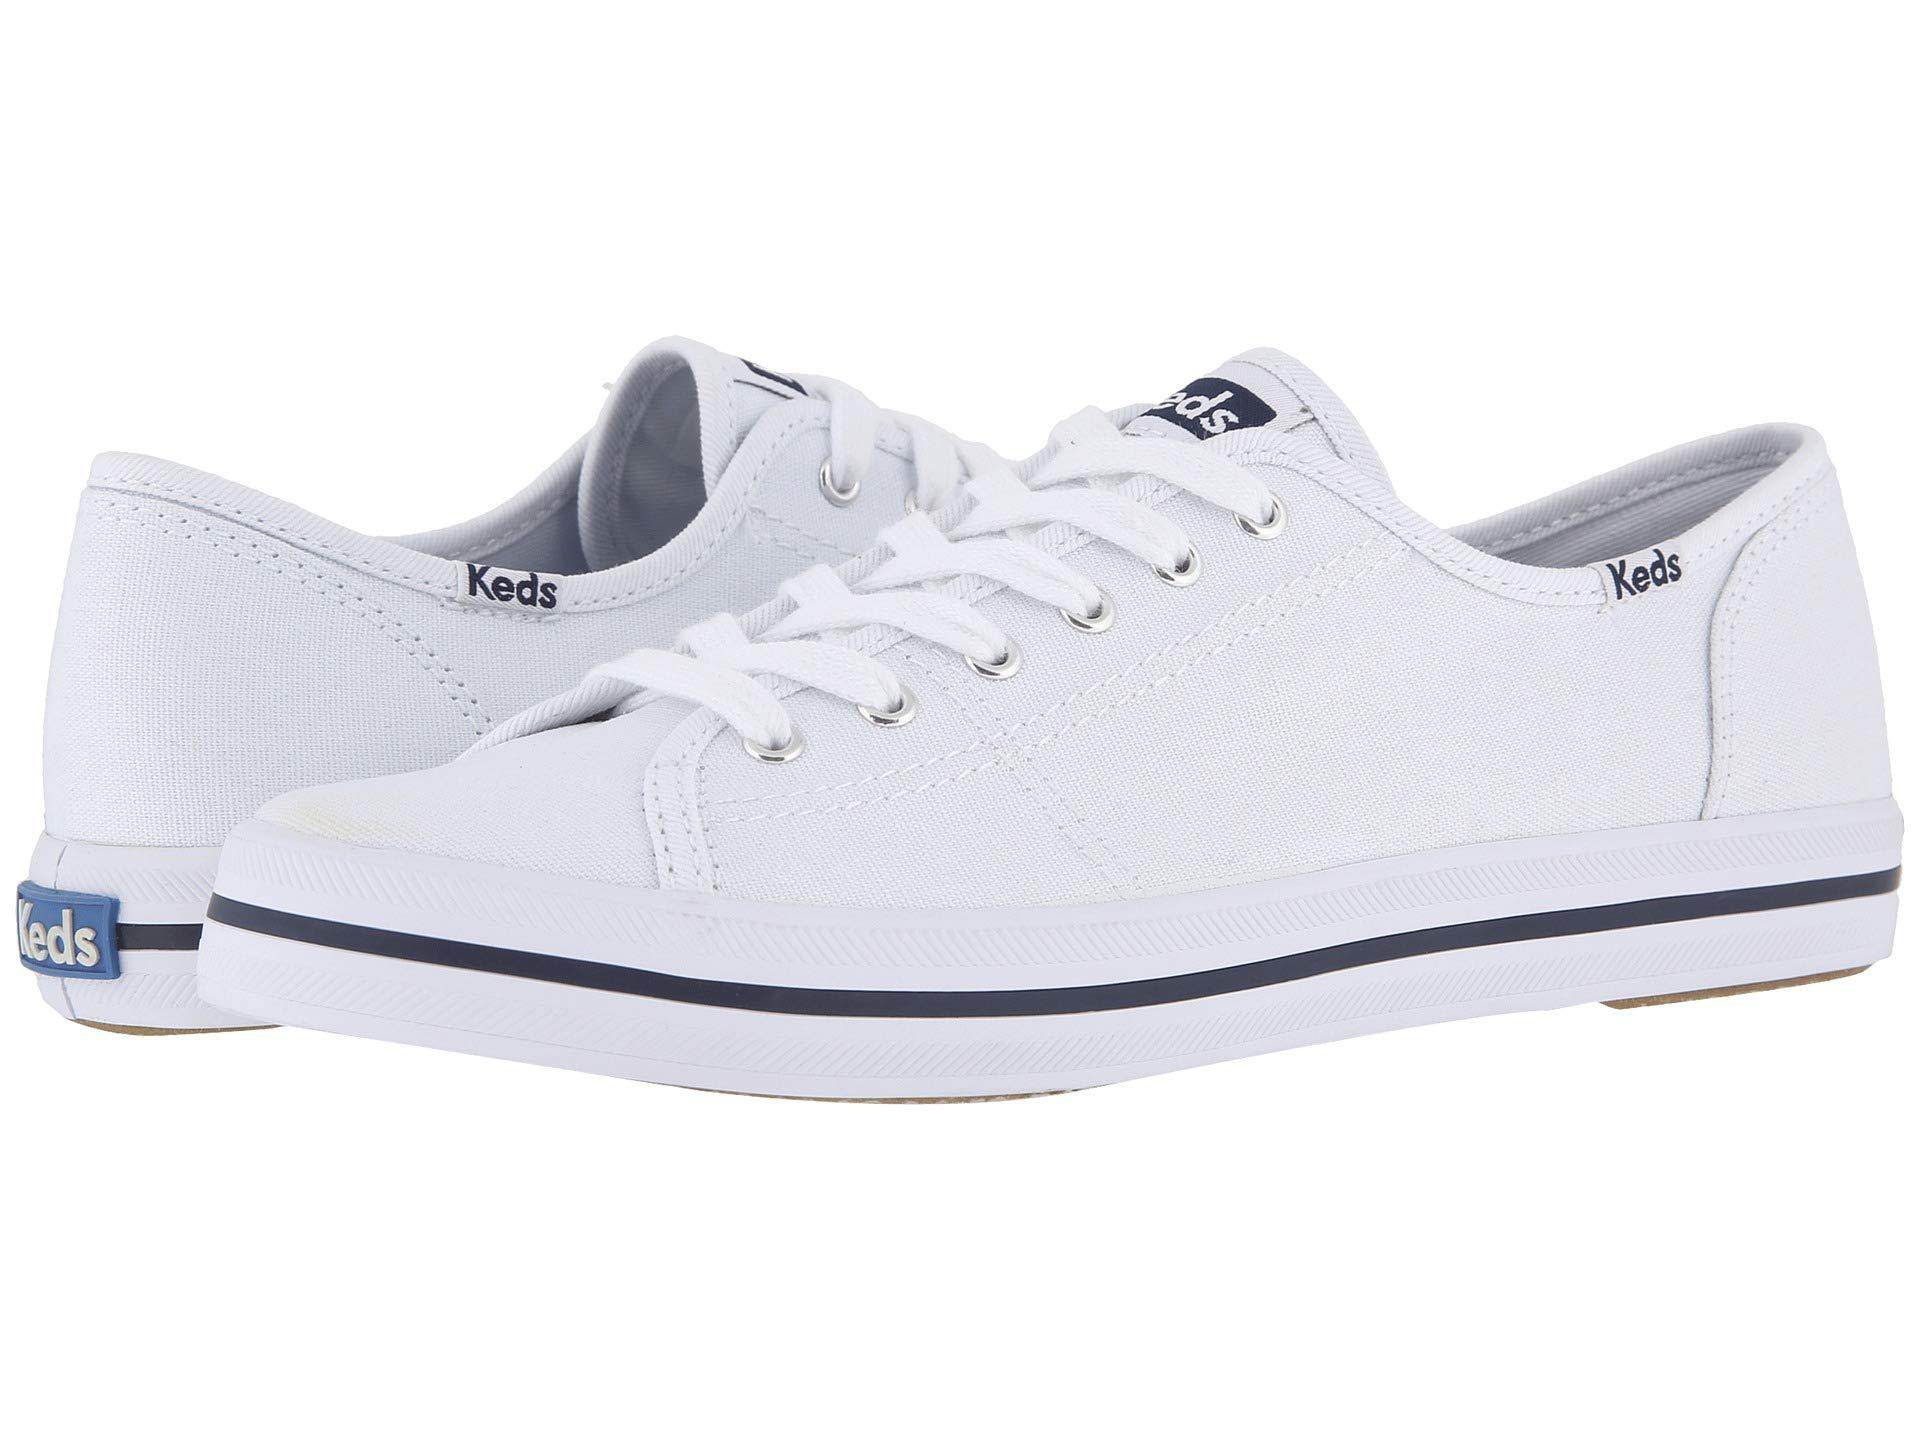 Keds - White Kickstart (navy) Women s Lace Up Casual Shoes - Lyst. View  fullscreen 39739369a